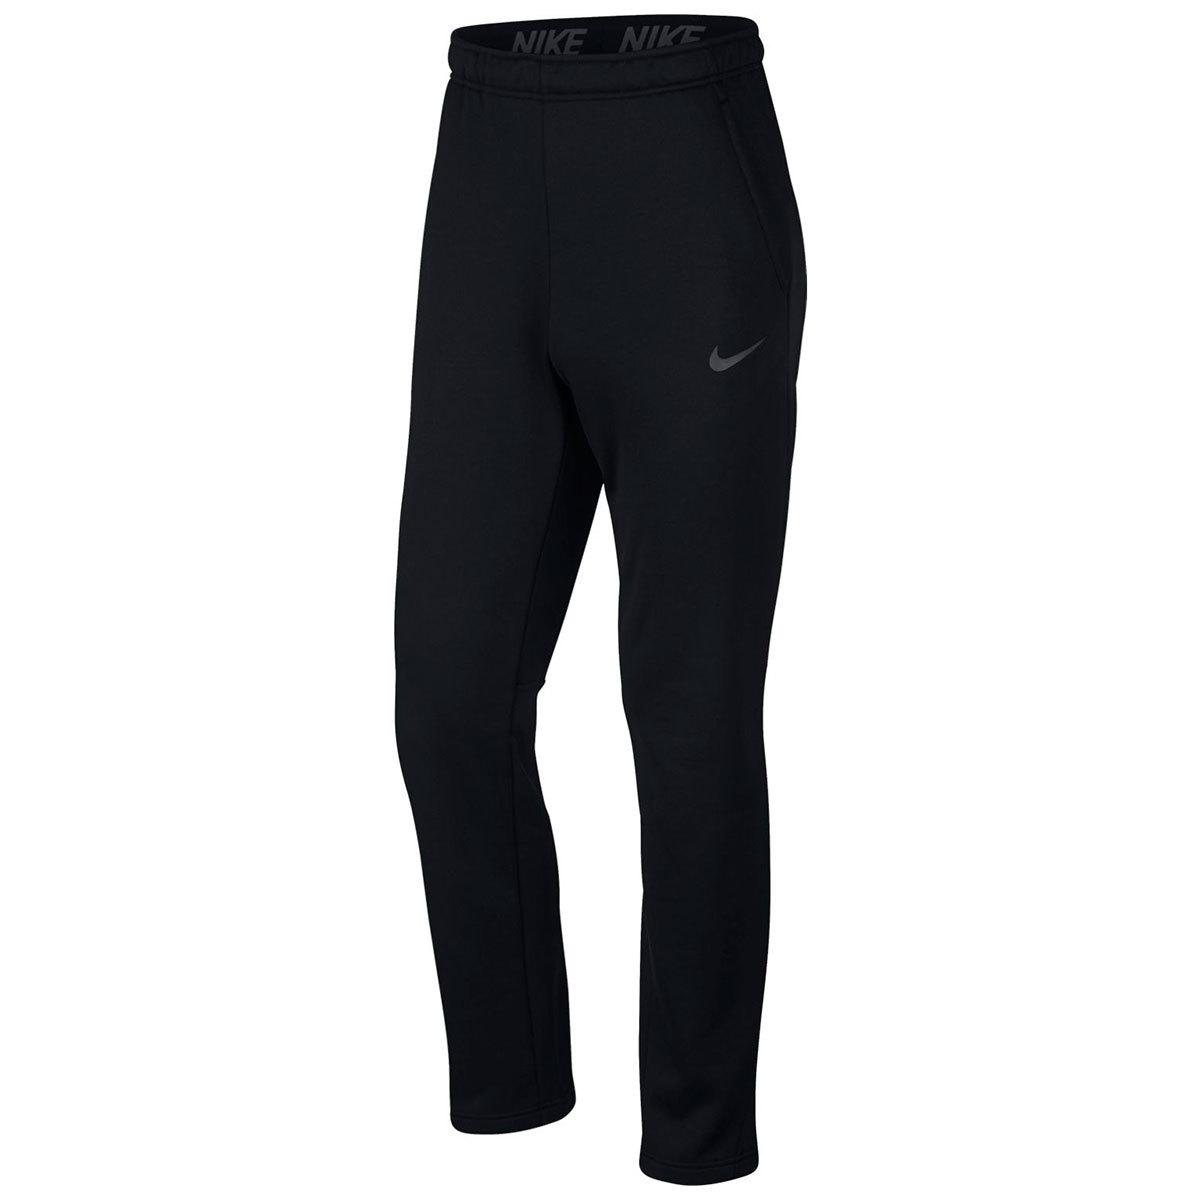 Nike Men's Therma Fleece Regular Pants - Black, S